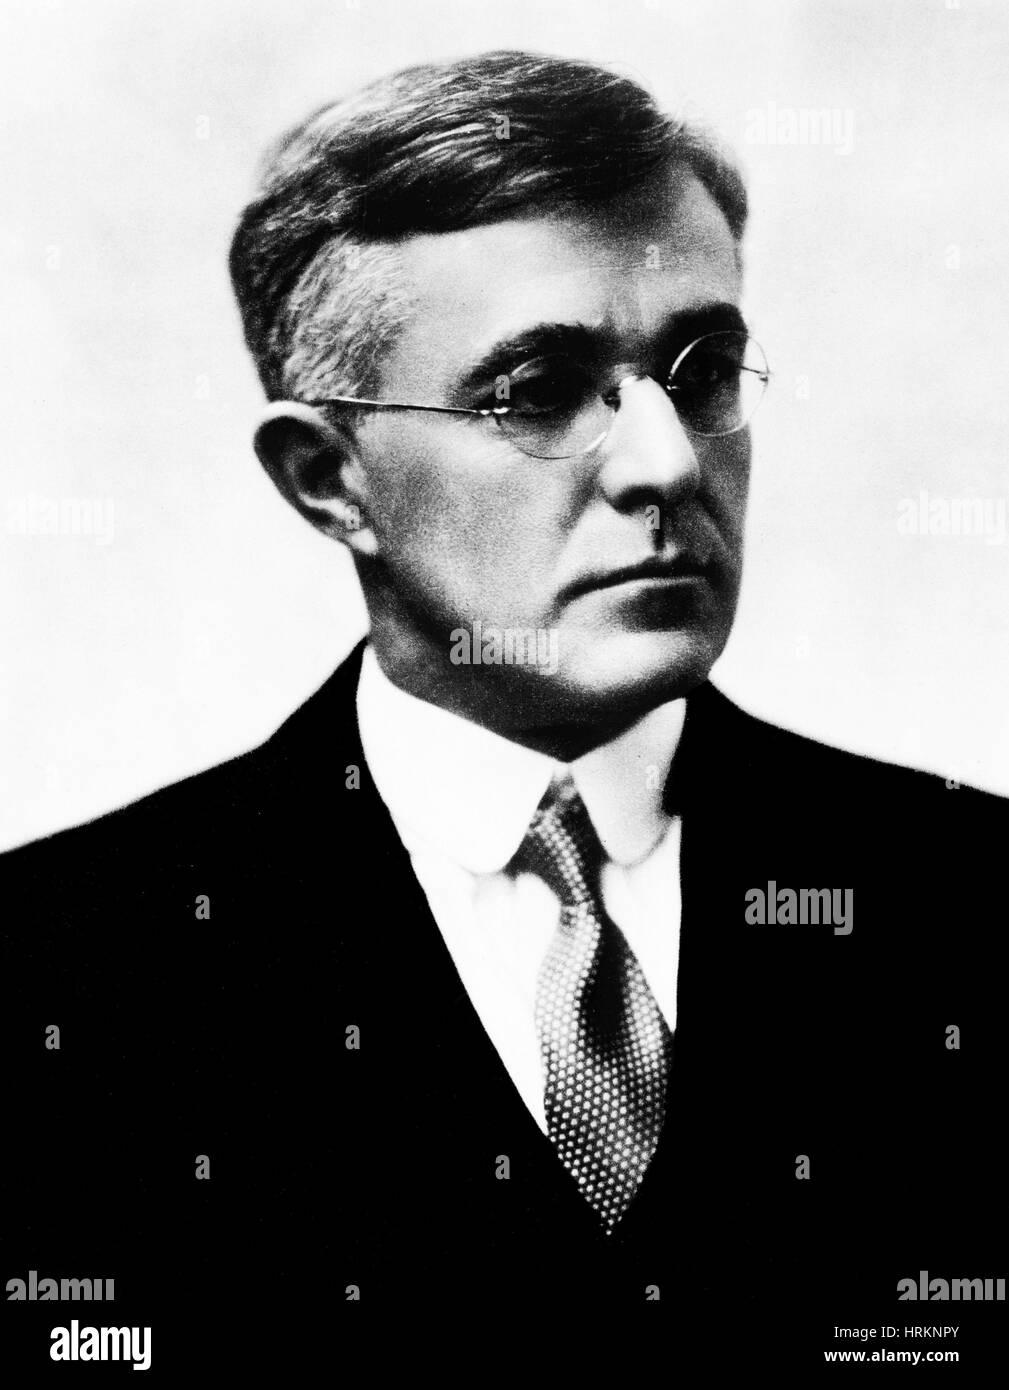 Irving Langmuir, American Chemist - Stock Image